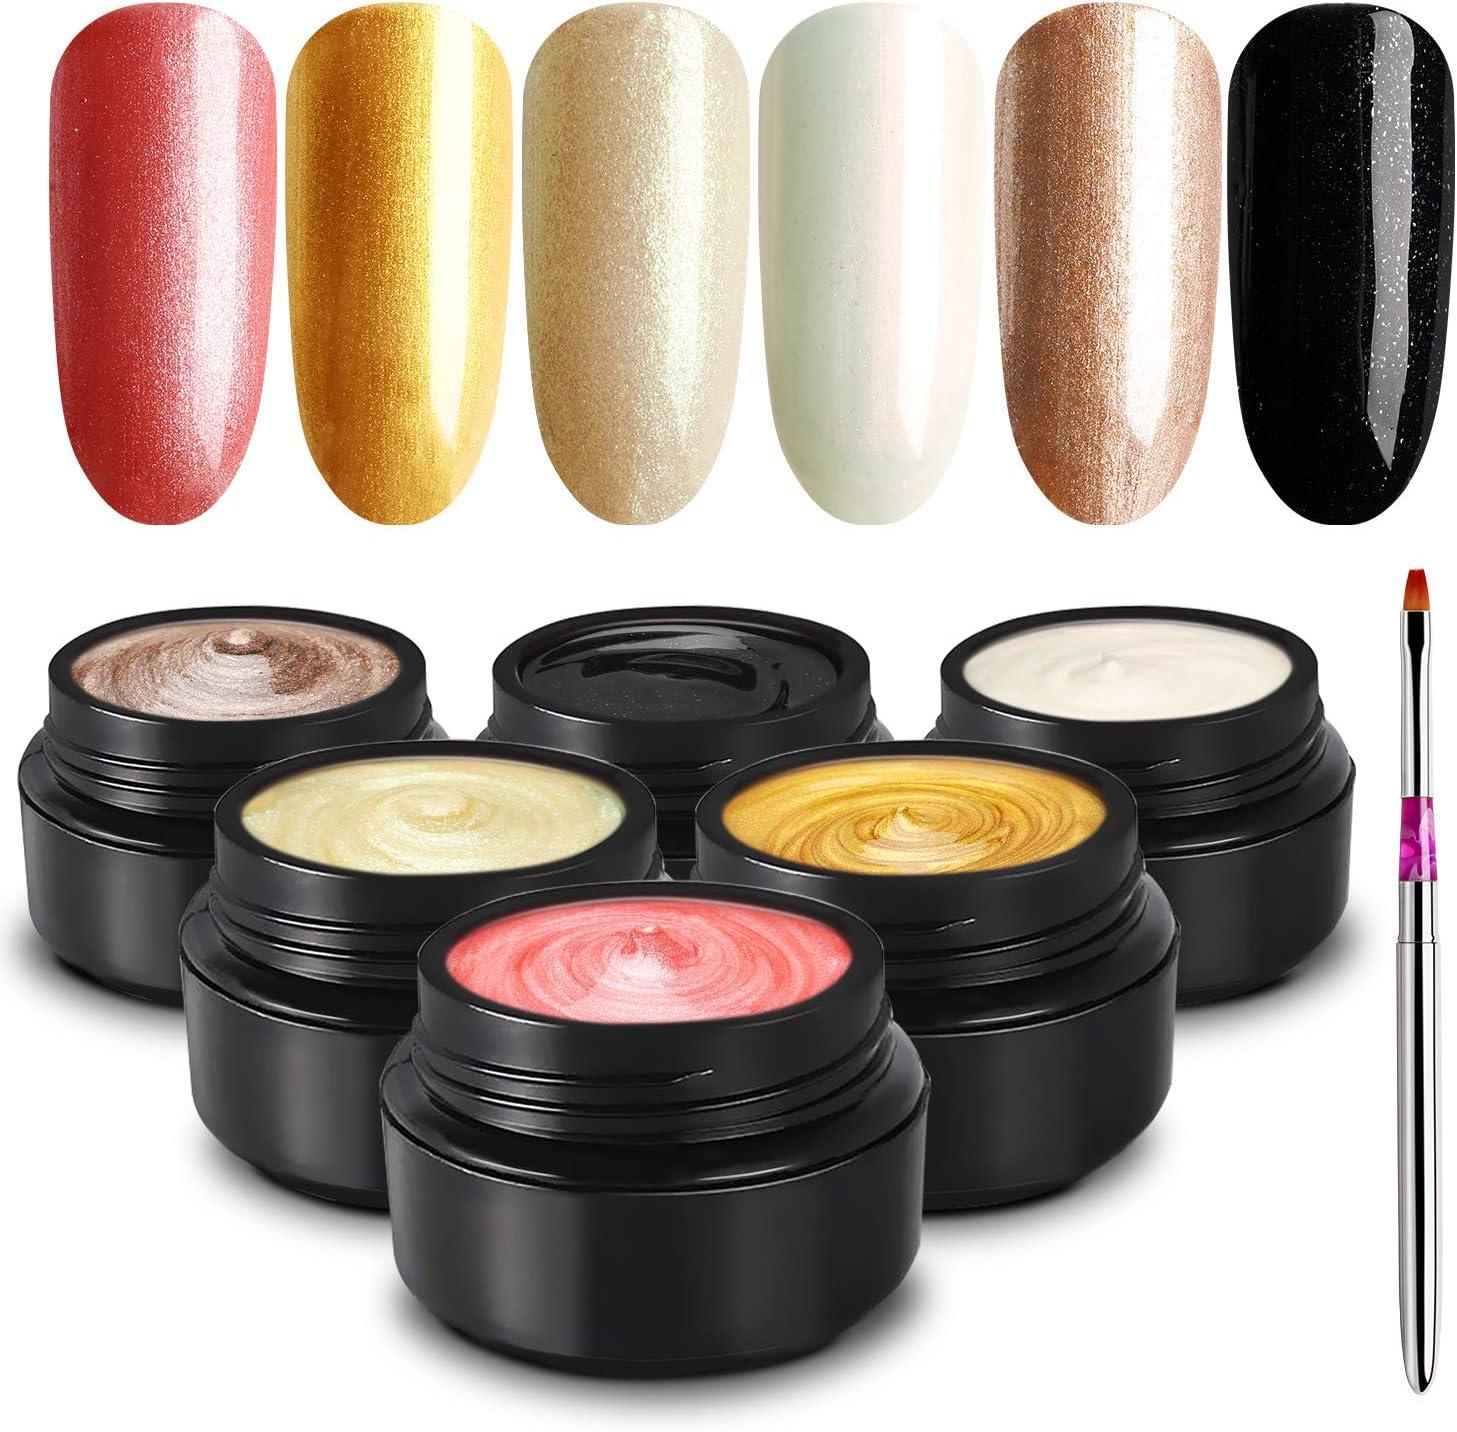 TOMICCA Glitter Gel Nail Polish Set, Golden Pink Black Diamond Gel Jar Kit, Fall Autumn UV LED Glitter Gel Polish, Soak Off Nail Gel Polish Starter Kit, Gel Manicure at Home Kit, Non Toxic - 6 Color